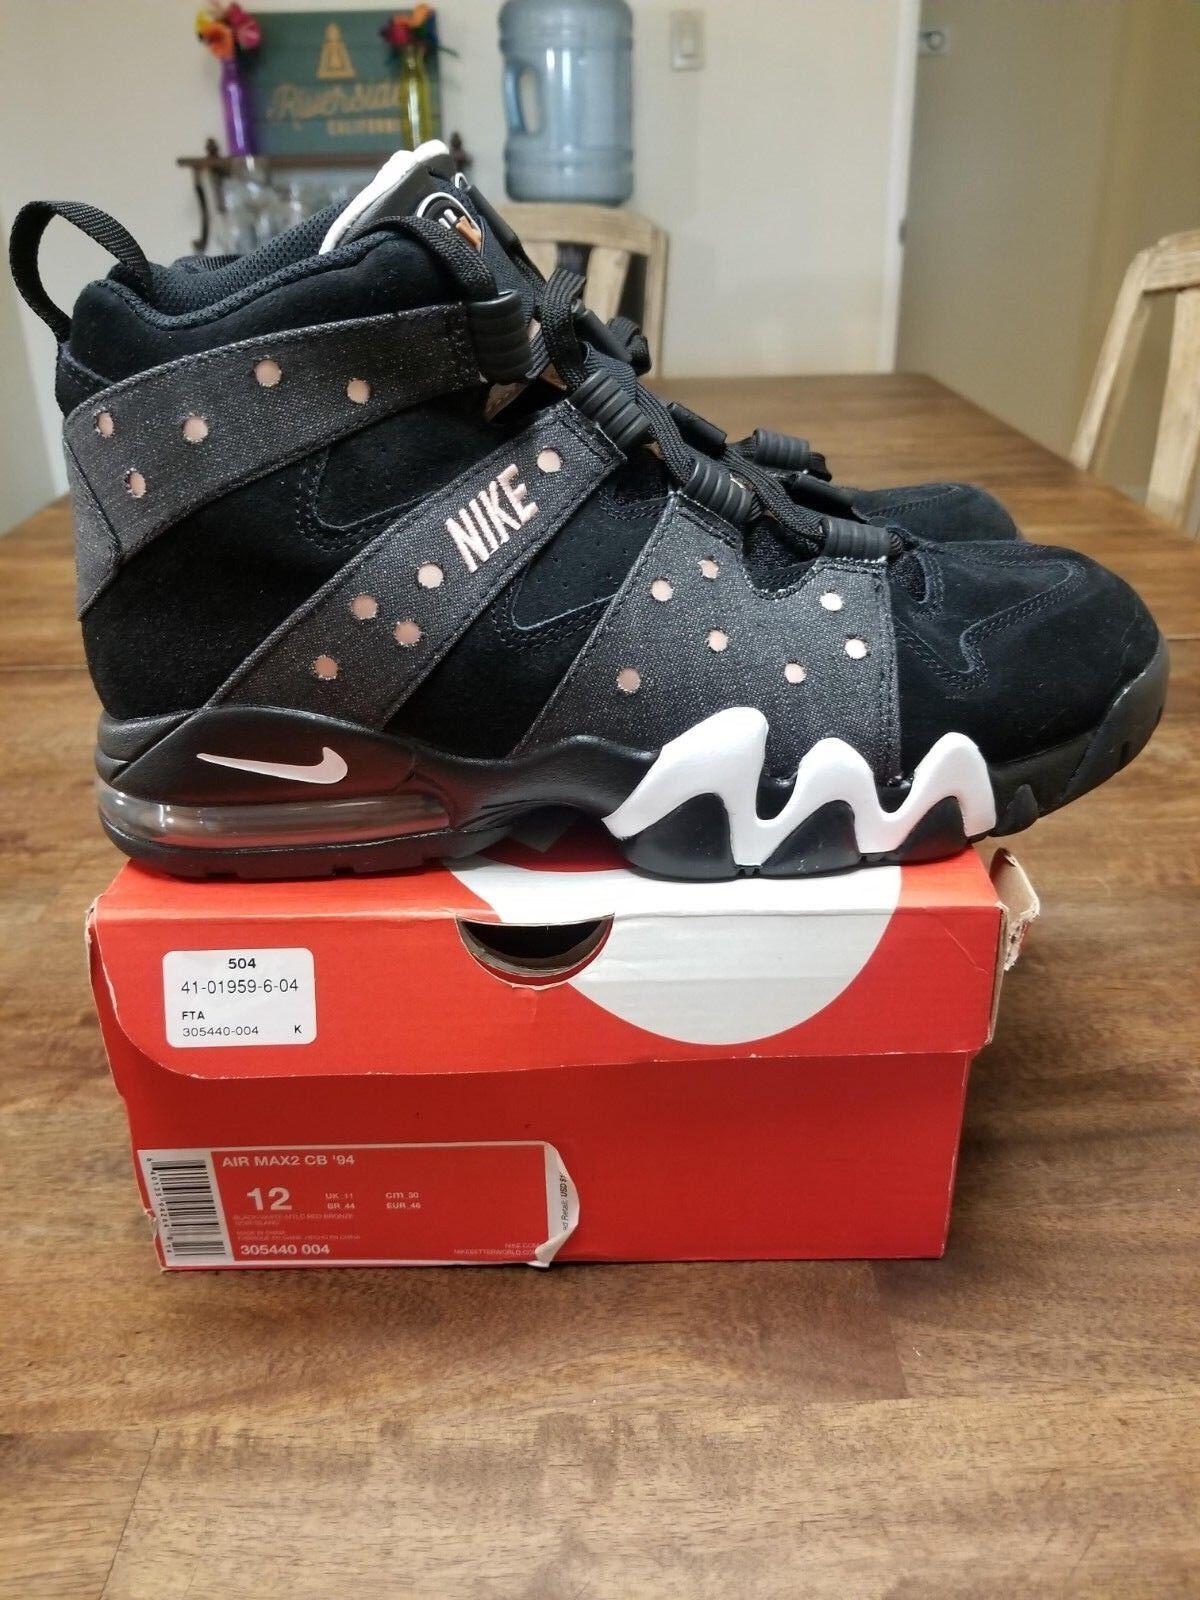 Nike air cb max - 2 cb air - 94 charles barkley, schwarze schuhe 305440-004 männer bronze. 6cf2fb